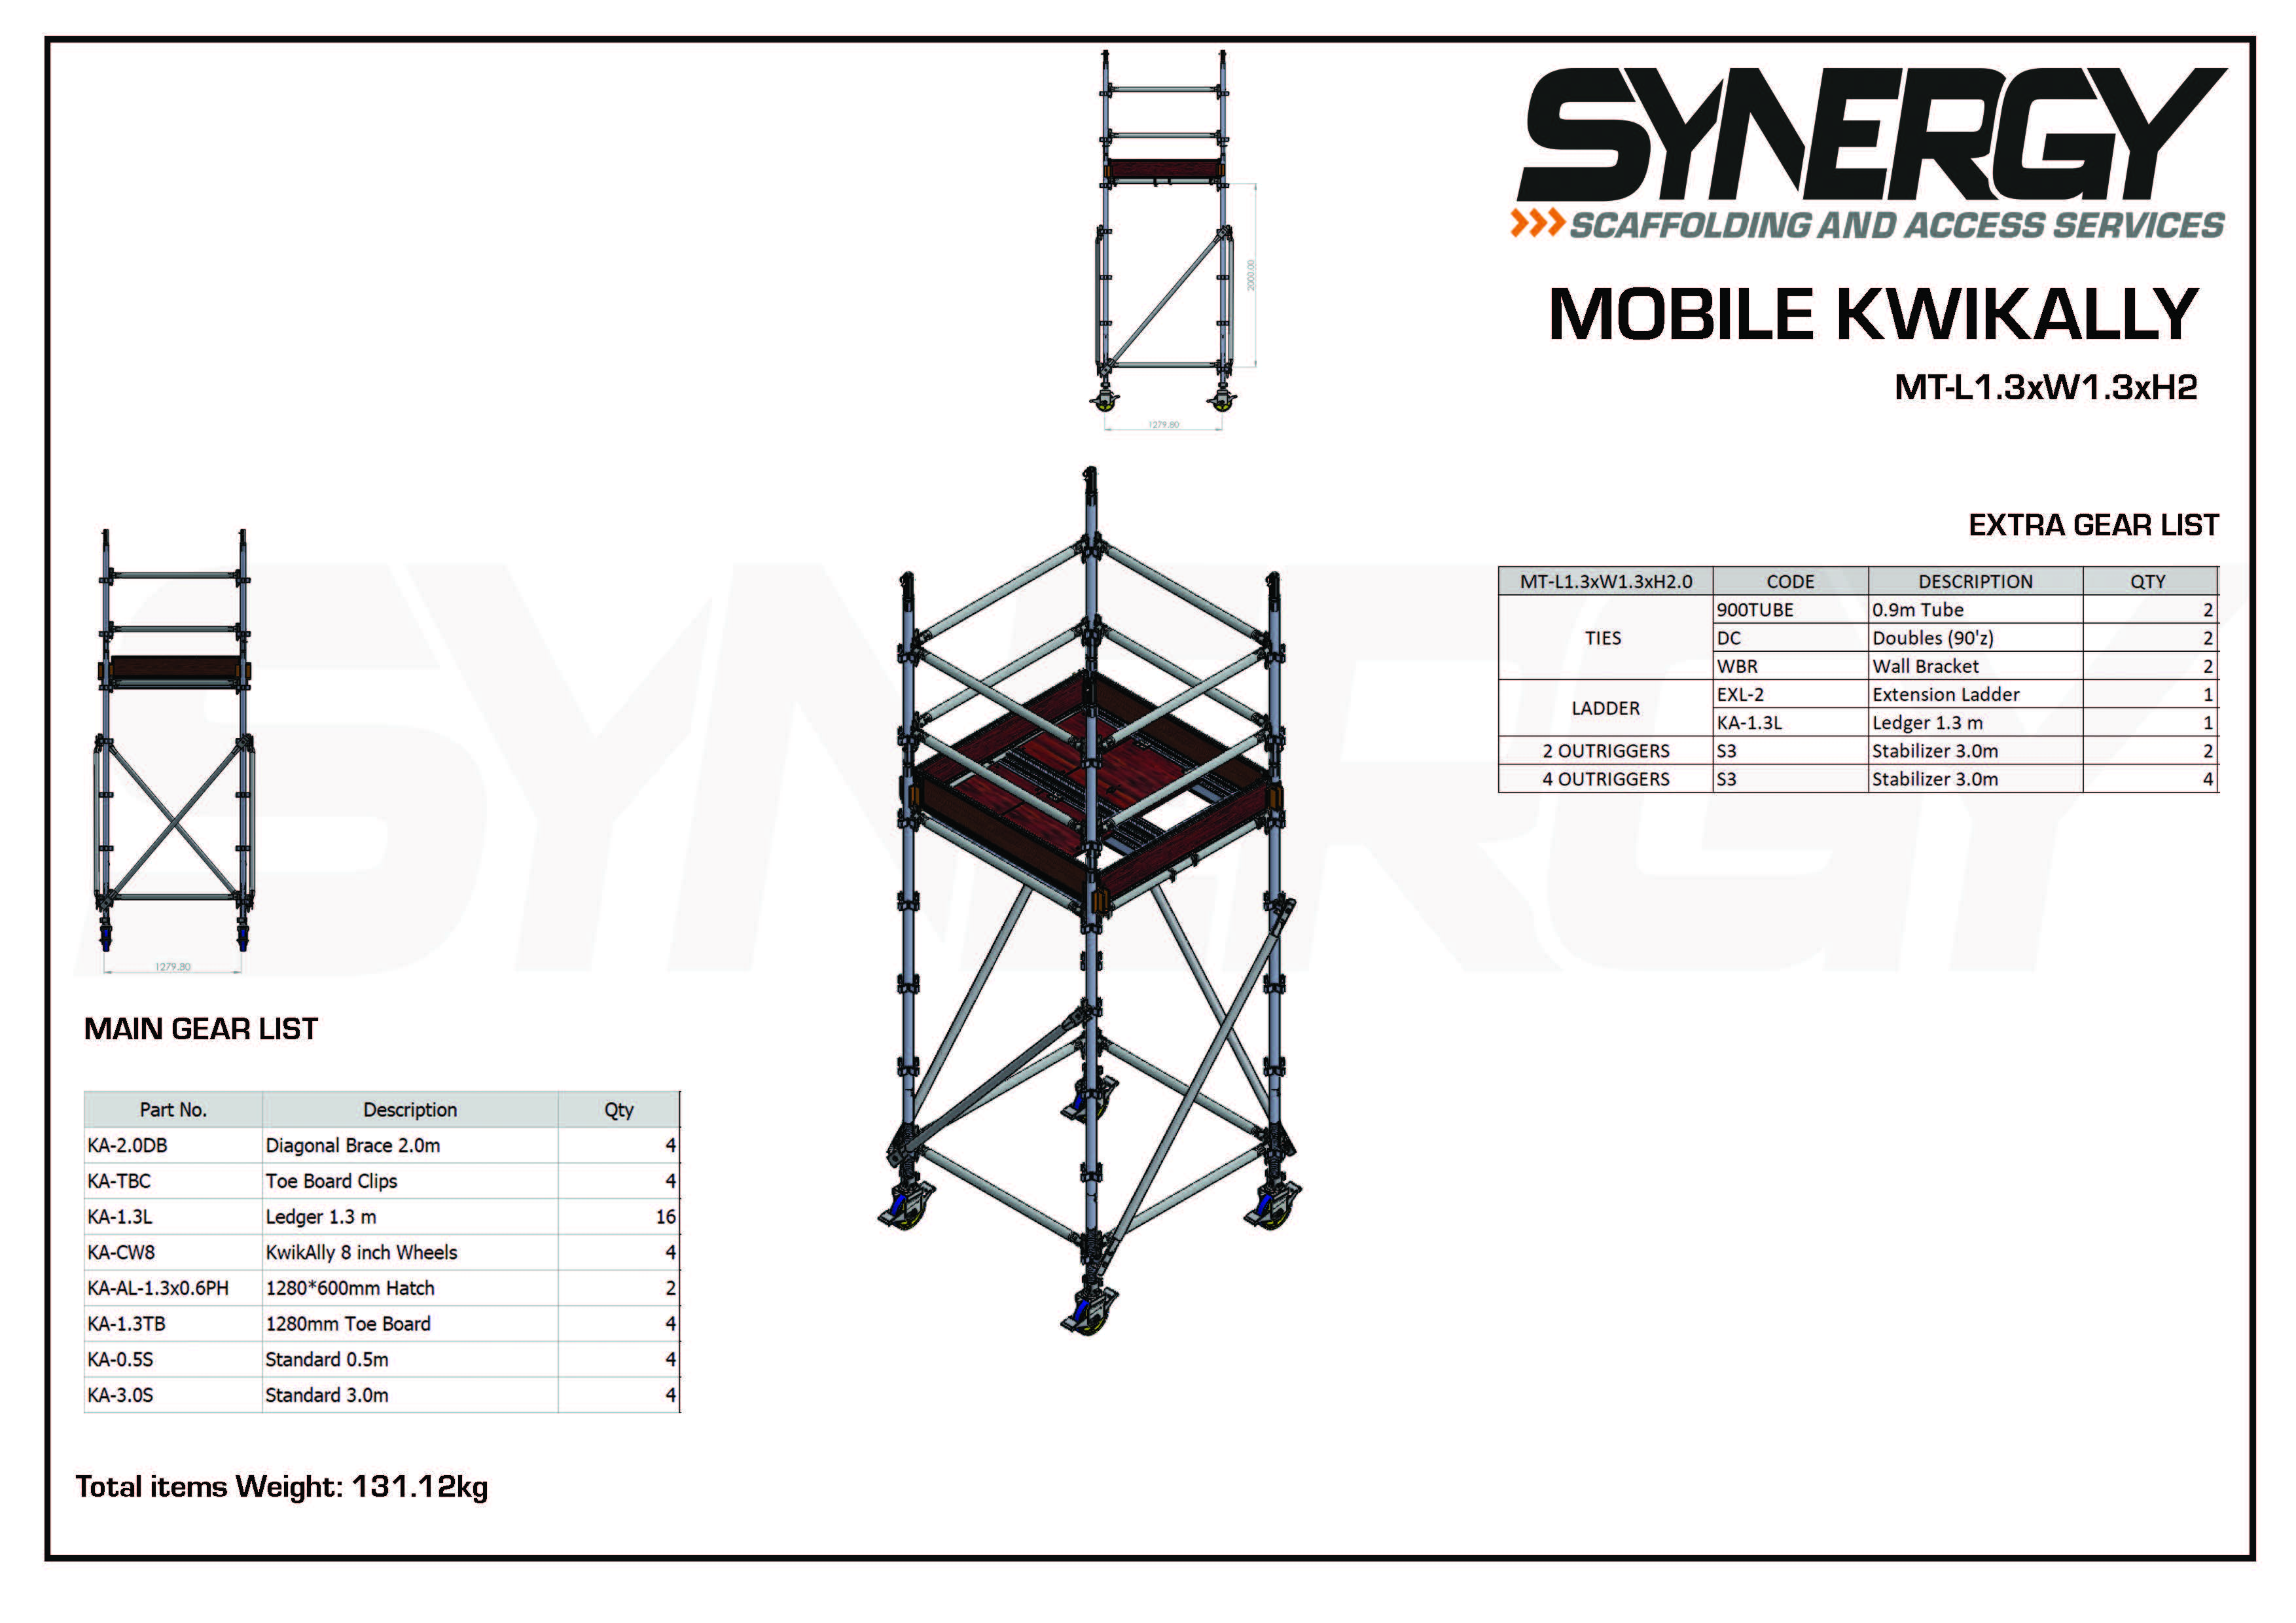 Kwikally Mobile 1.3m x 1.3m x 2m(Height)